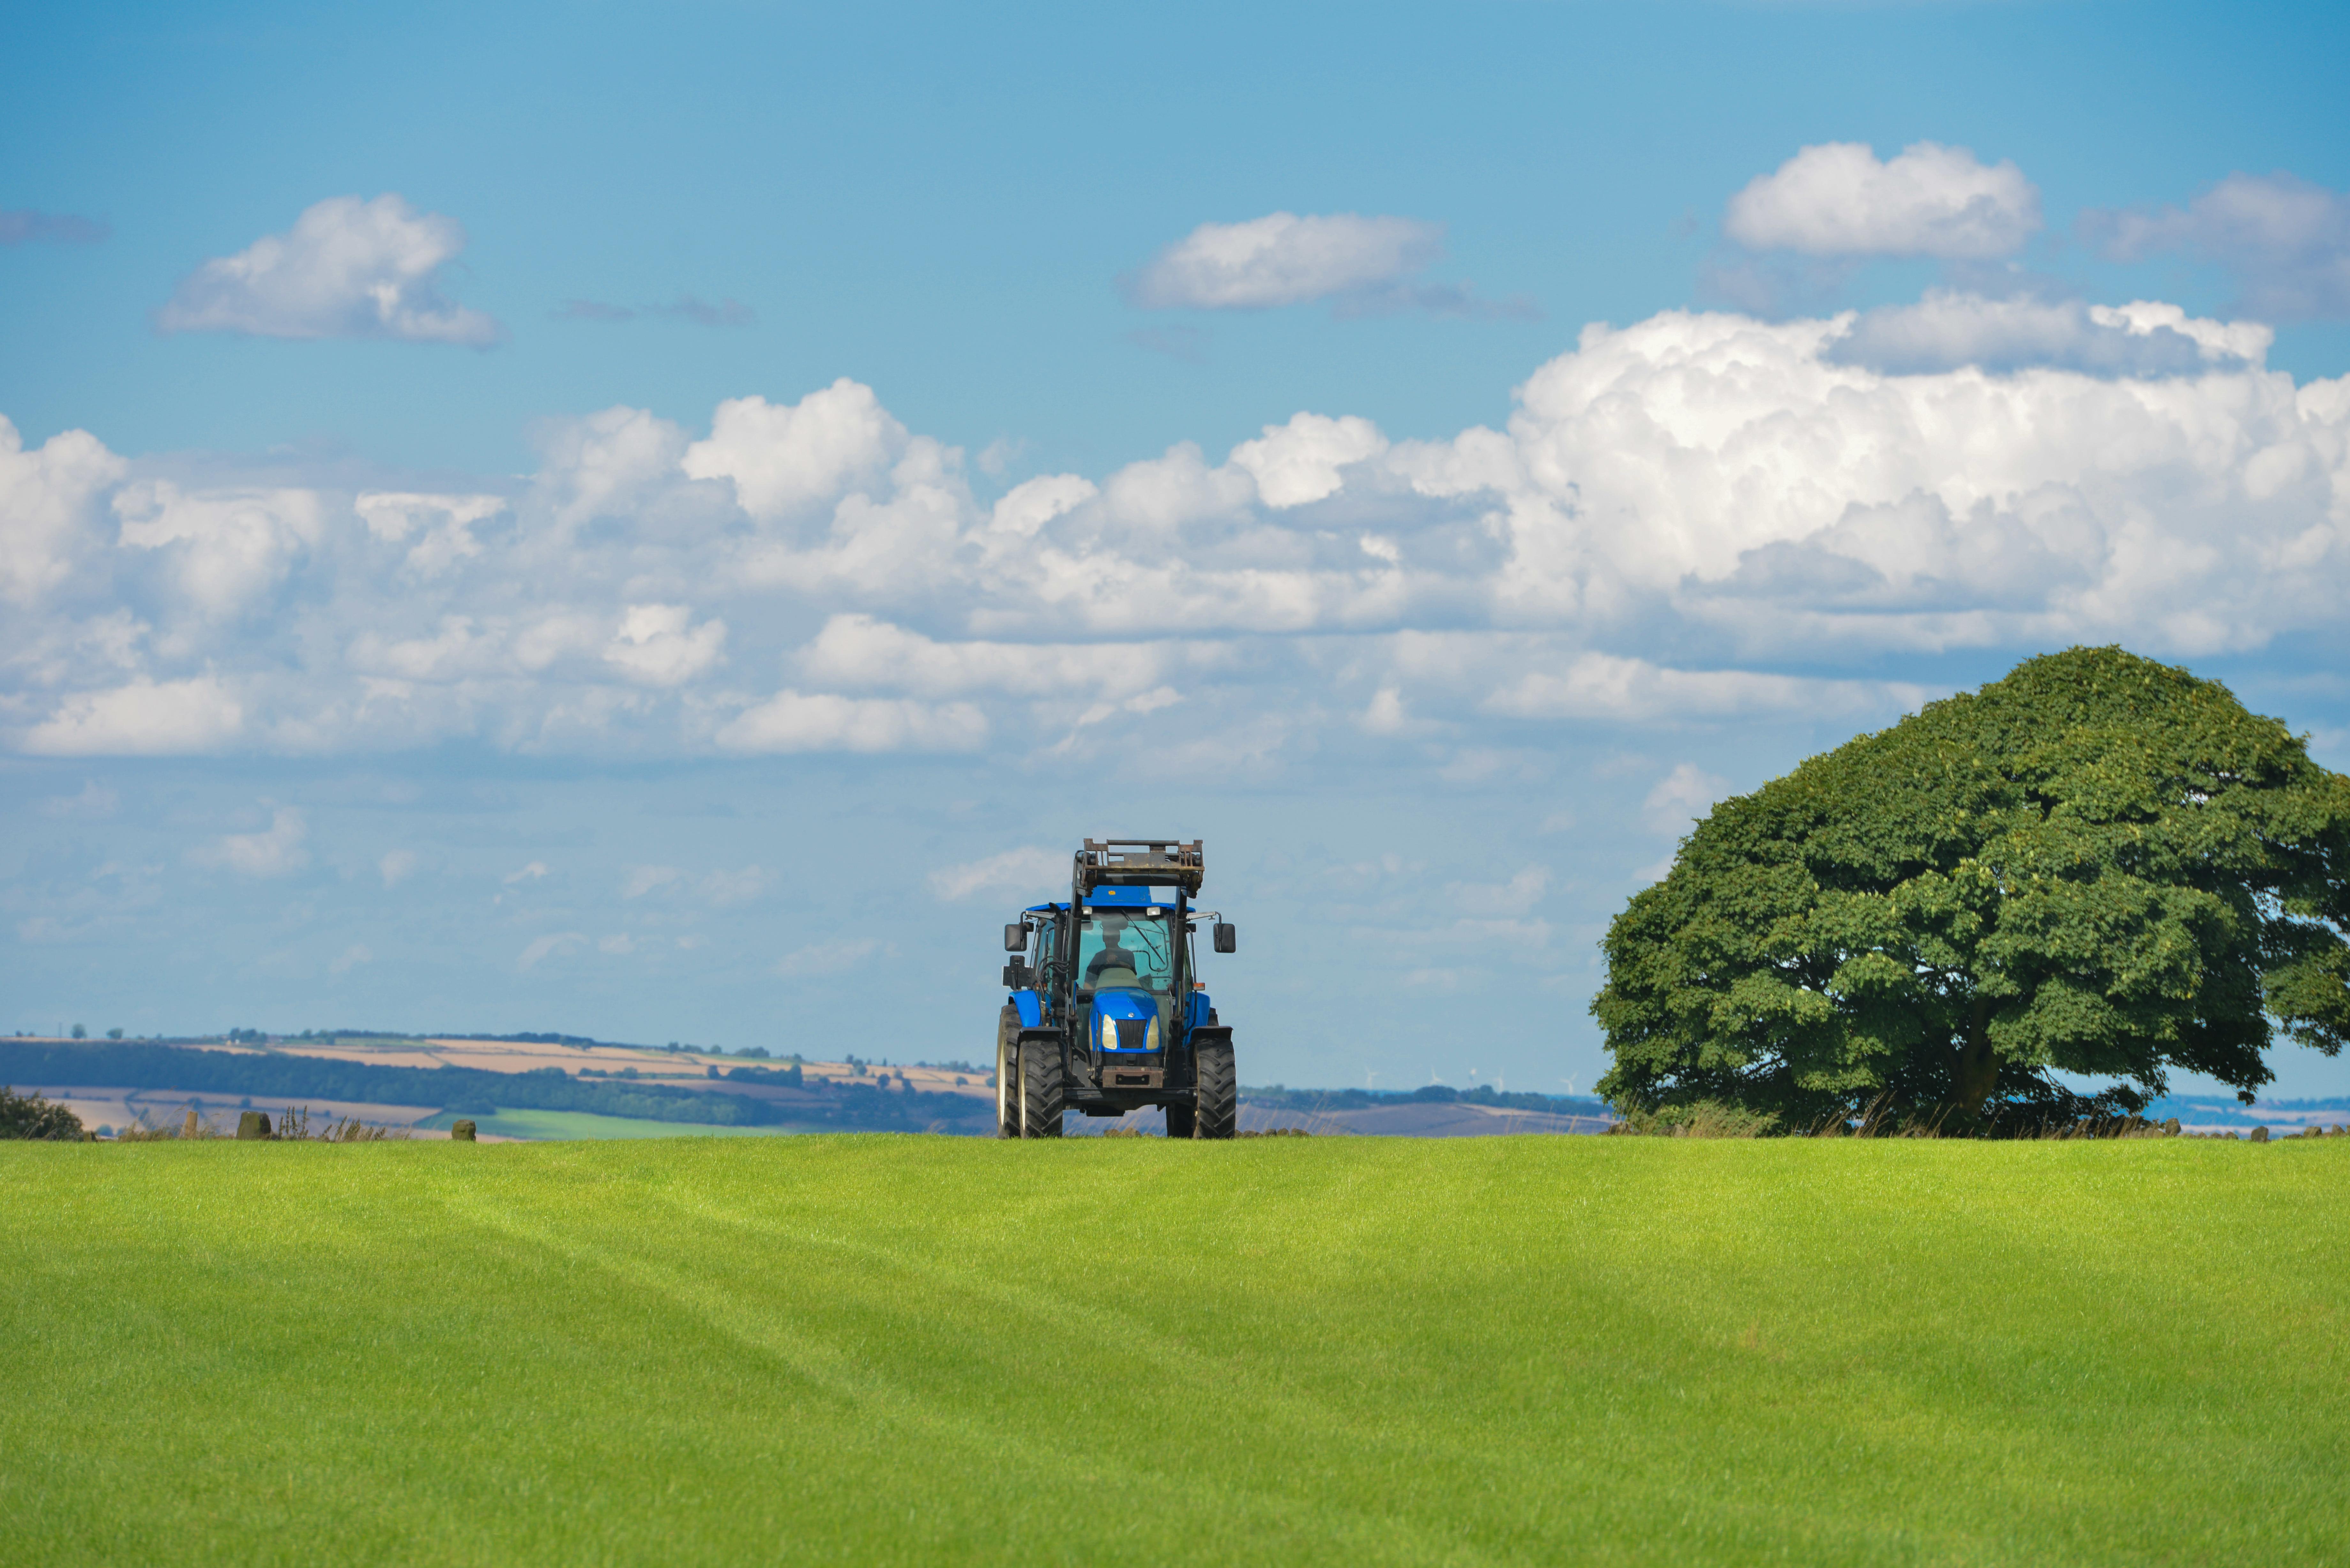 field-agriculture-farm-grass